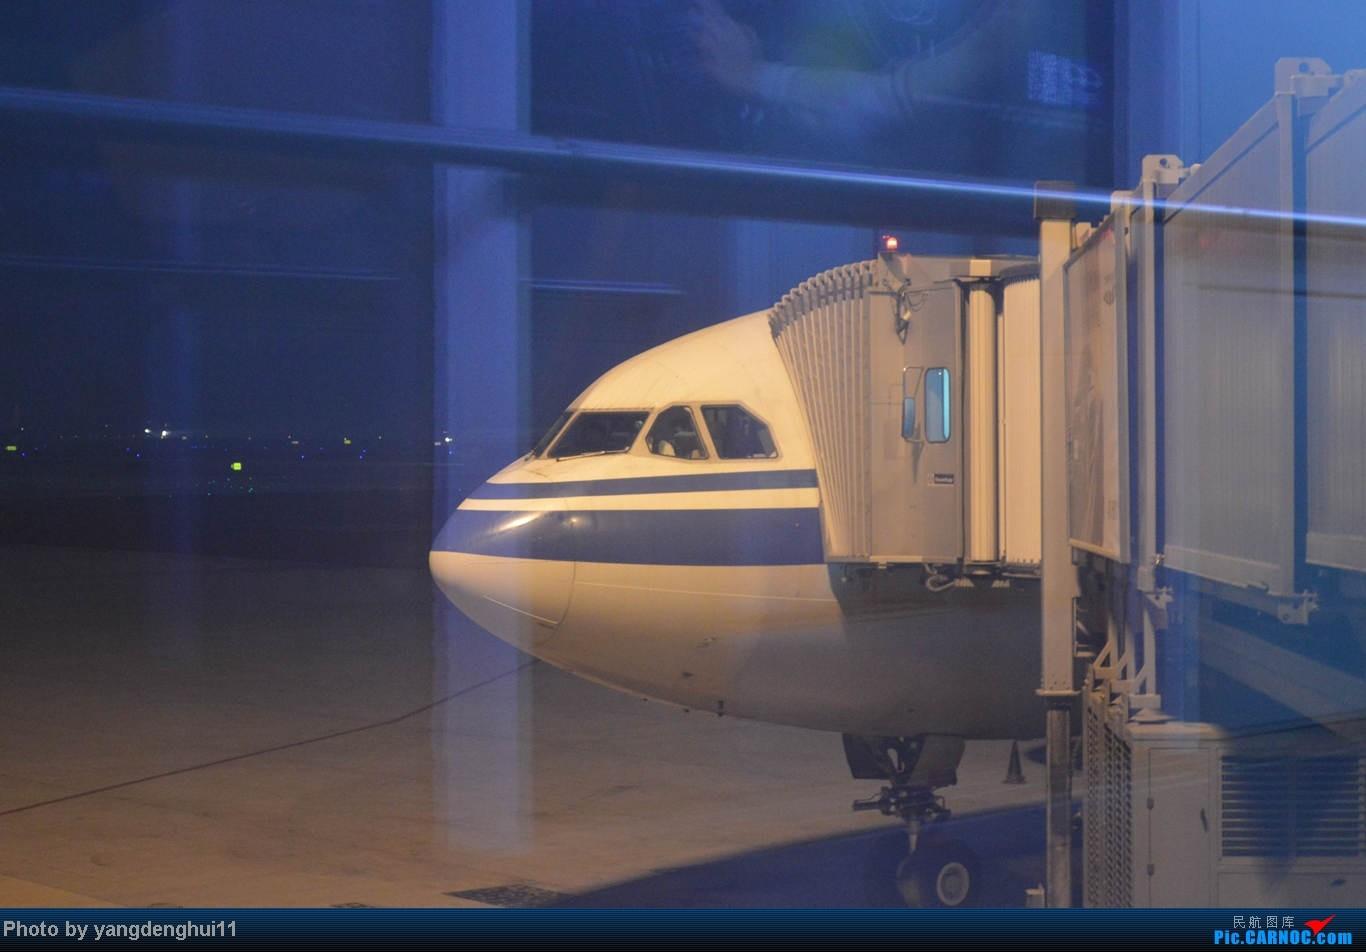 Re:[原创]春运帖 成都--上海虹桥--虹桥站--鳌江站 遇蓝凤凰,梦想之翼 AIRBUS A330-200 B-6081 中国成都双流机场